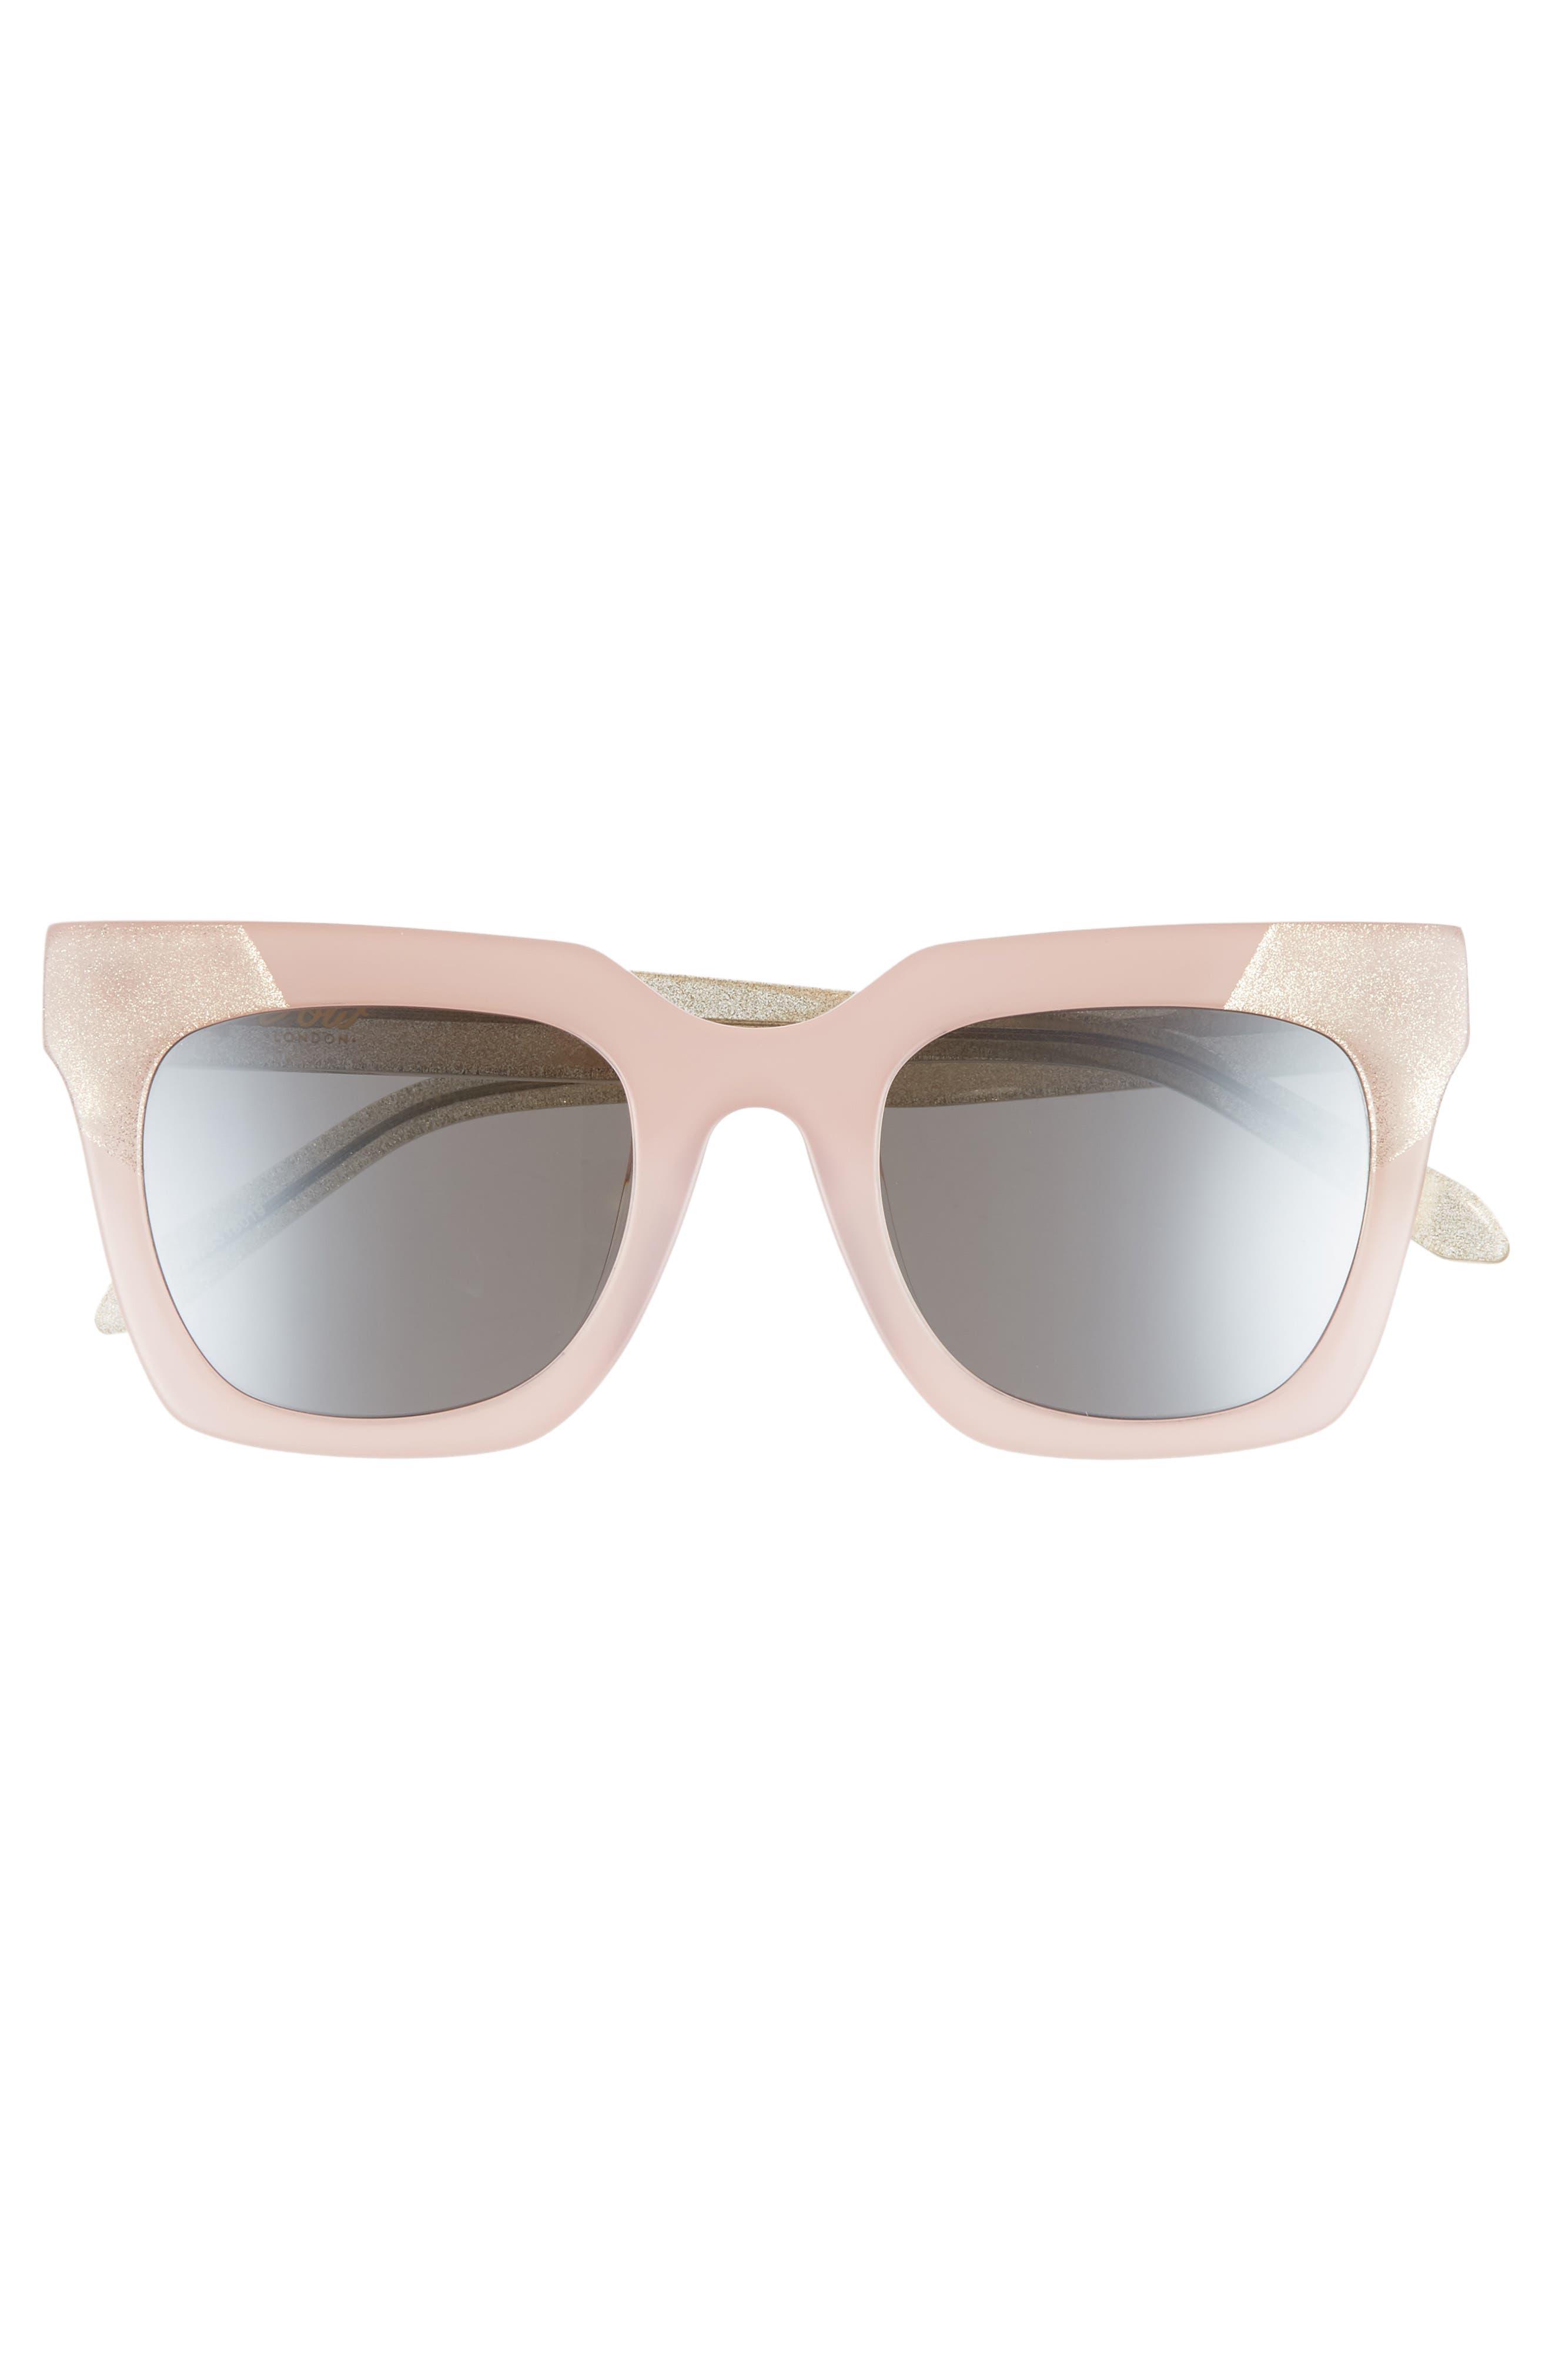 Riley 50mm Cat Eye Sunglasses,                             Alternate thumbnail 2, color,                             Milky Pink/ Smoke